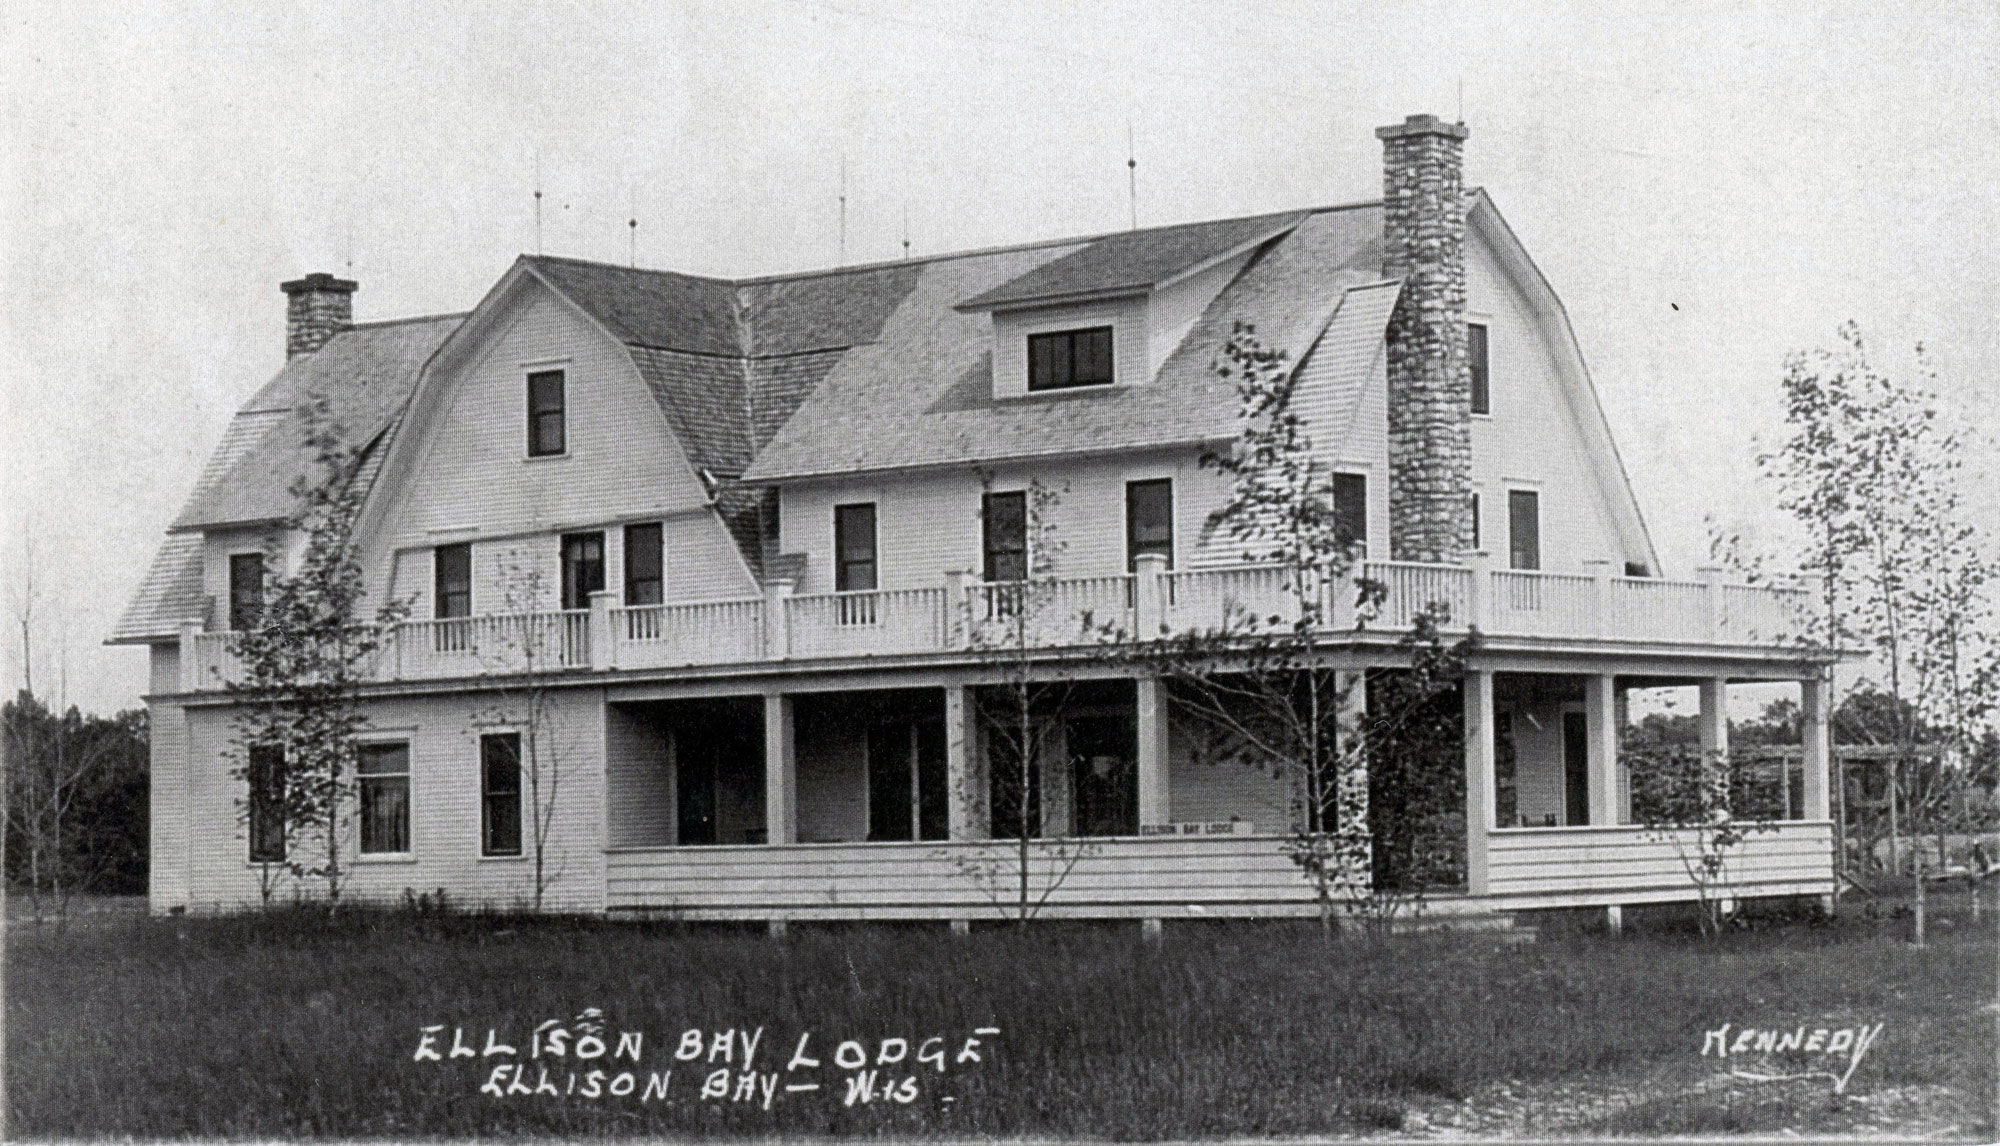 Ellison-Bay-Lodge